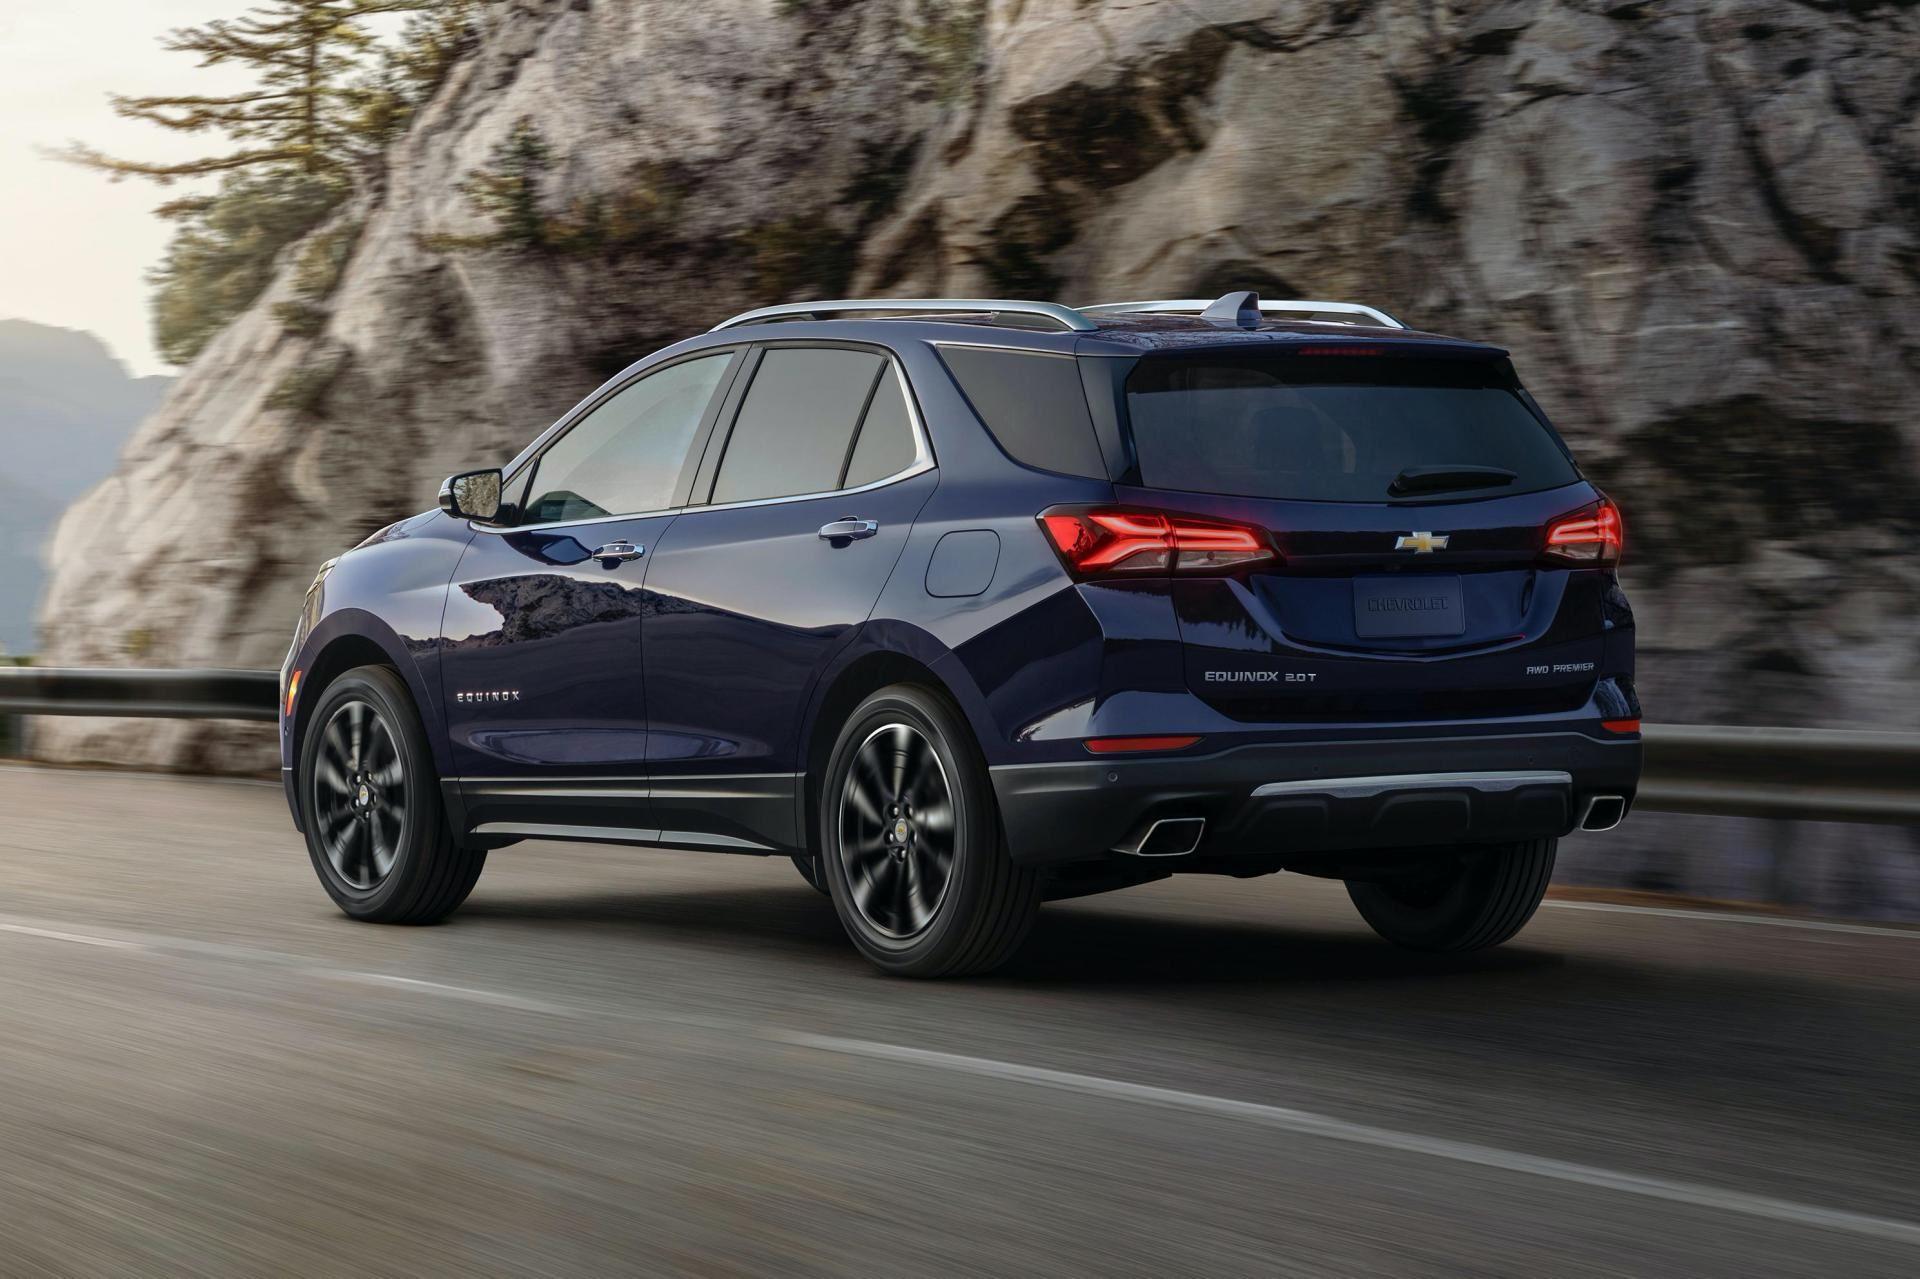 Chevrolet-Equinox-facelift-2020-12